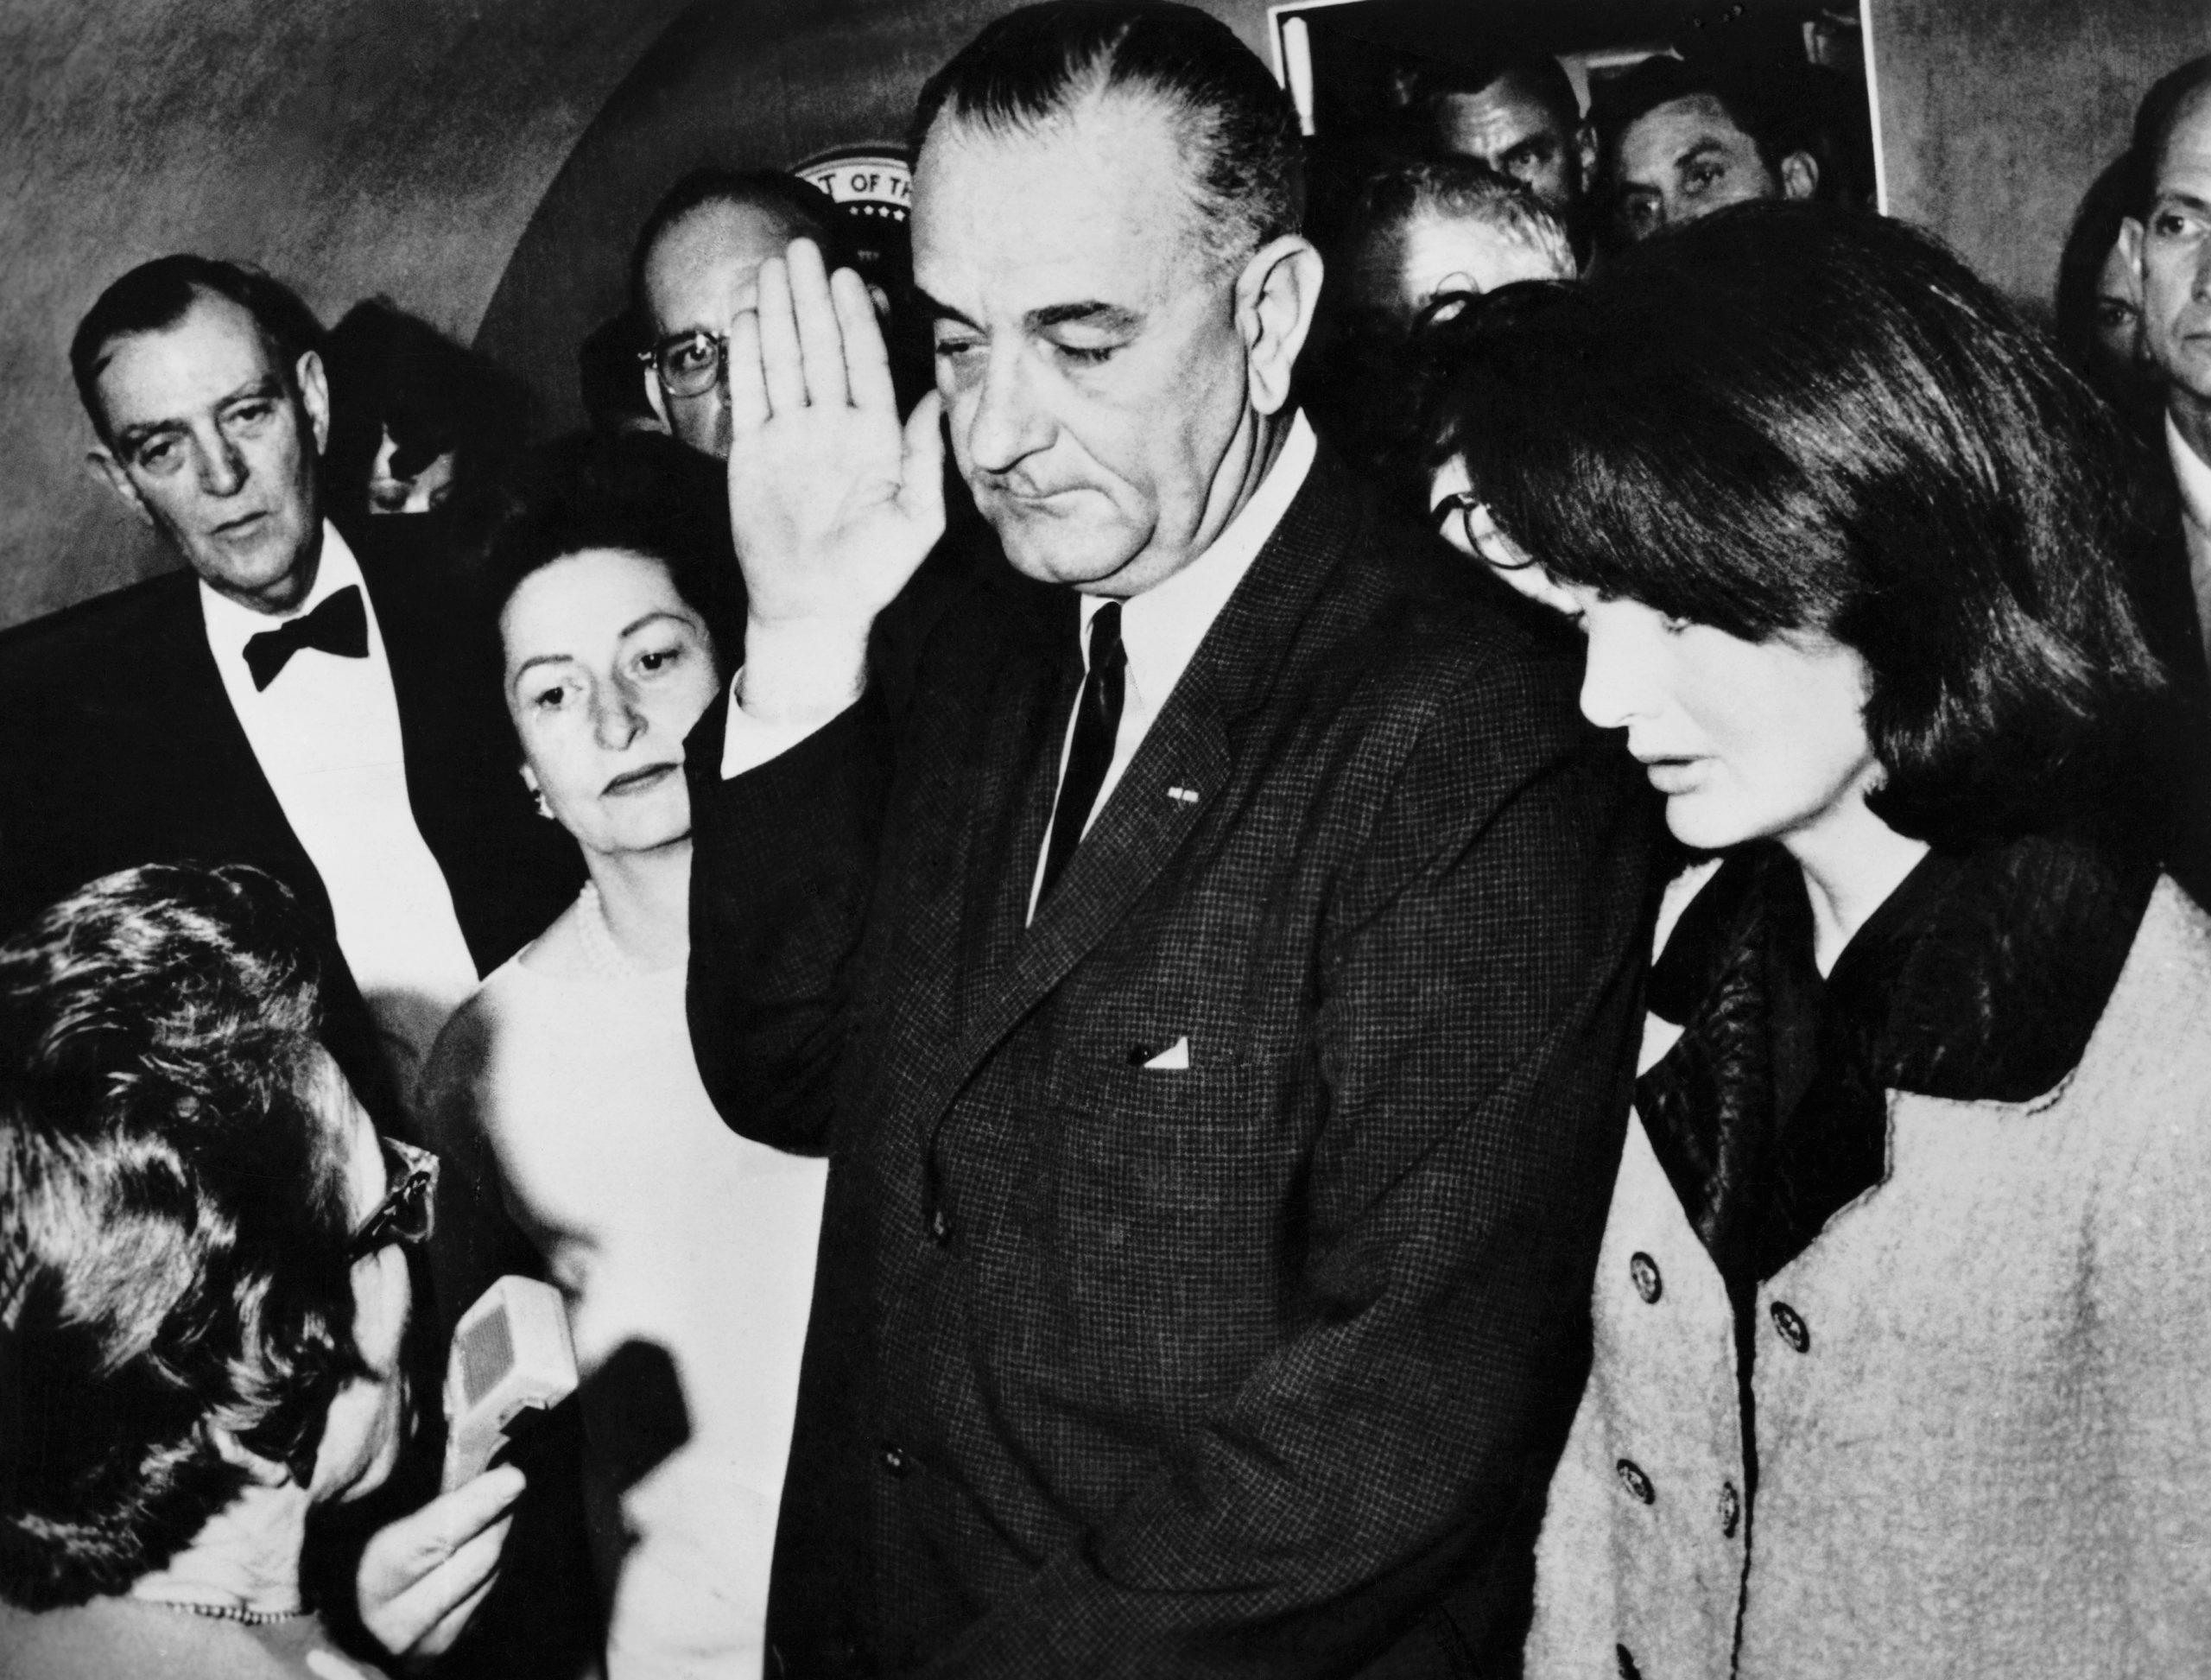 Lyndon B. Johnson Being Inaugurated